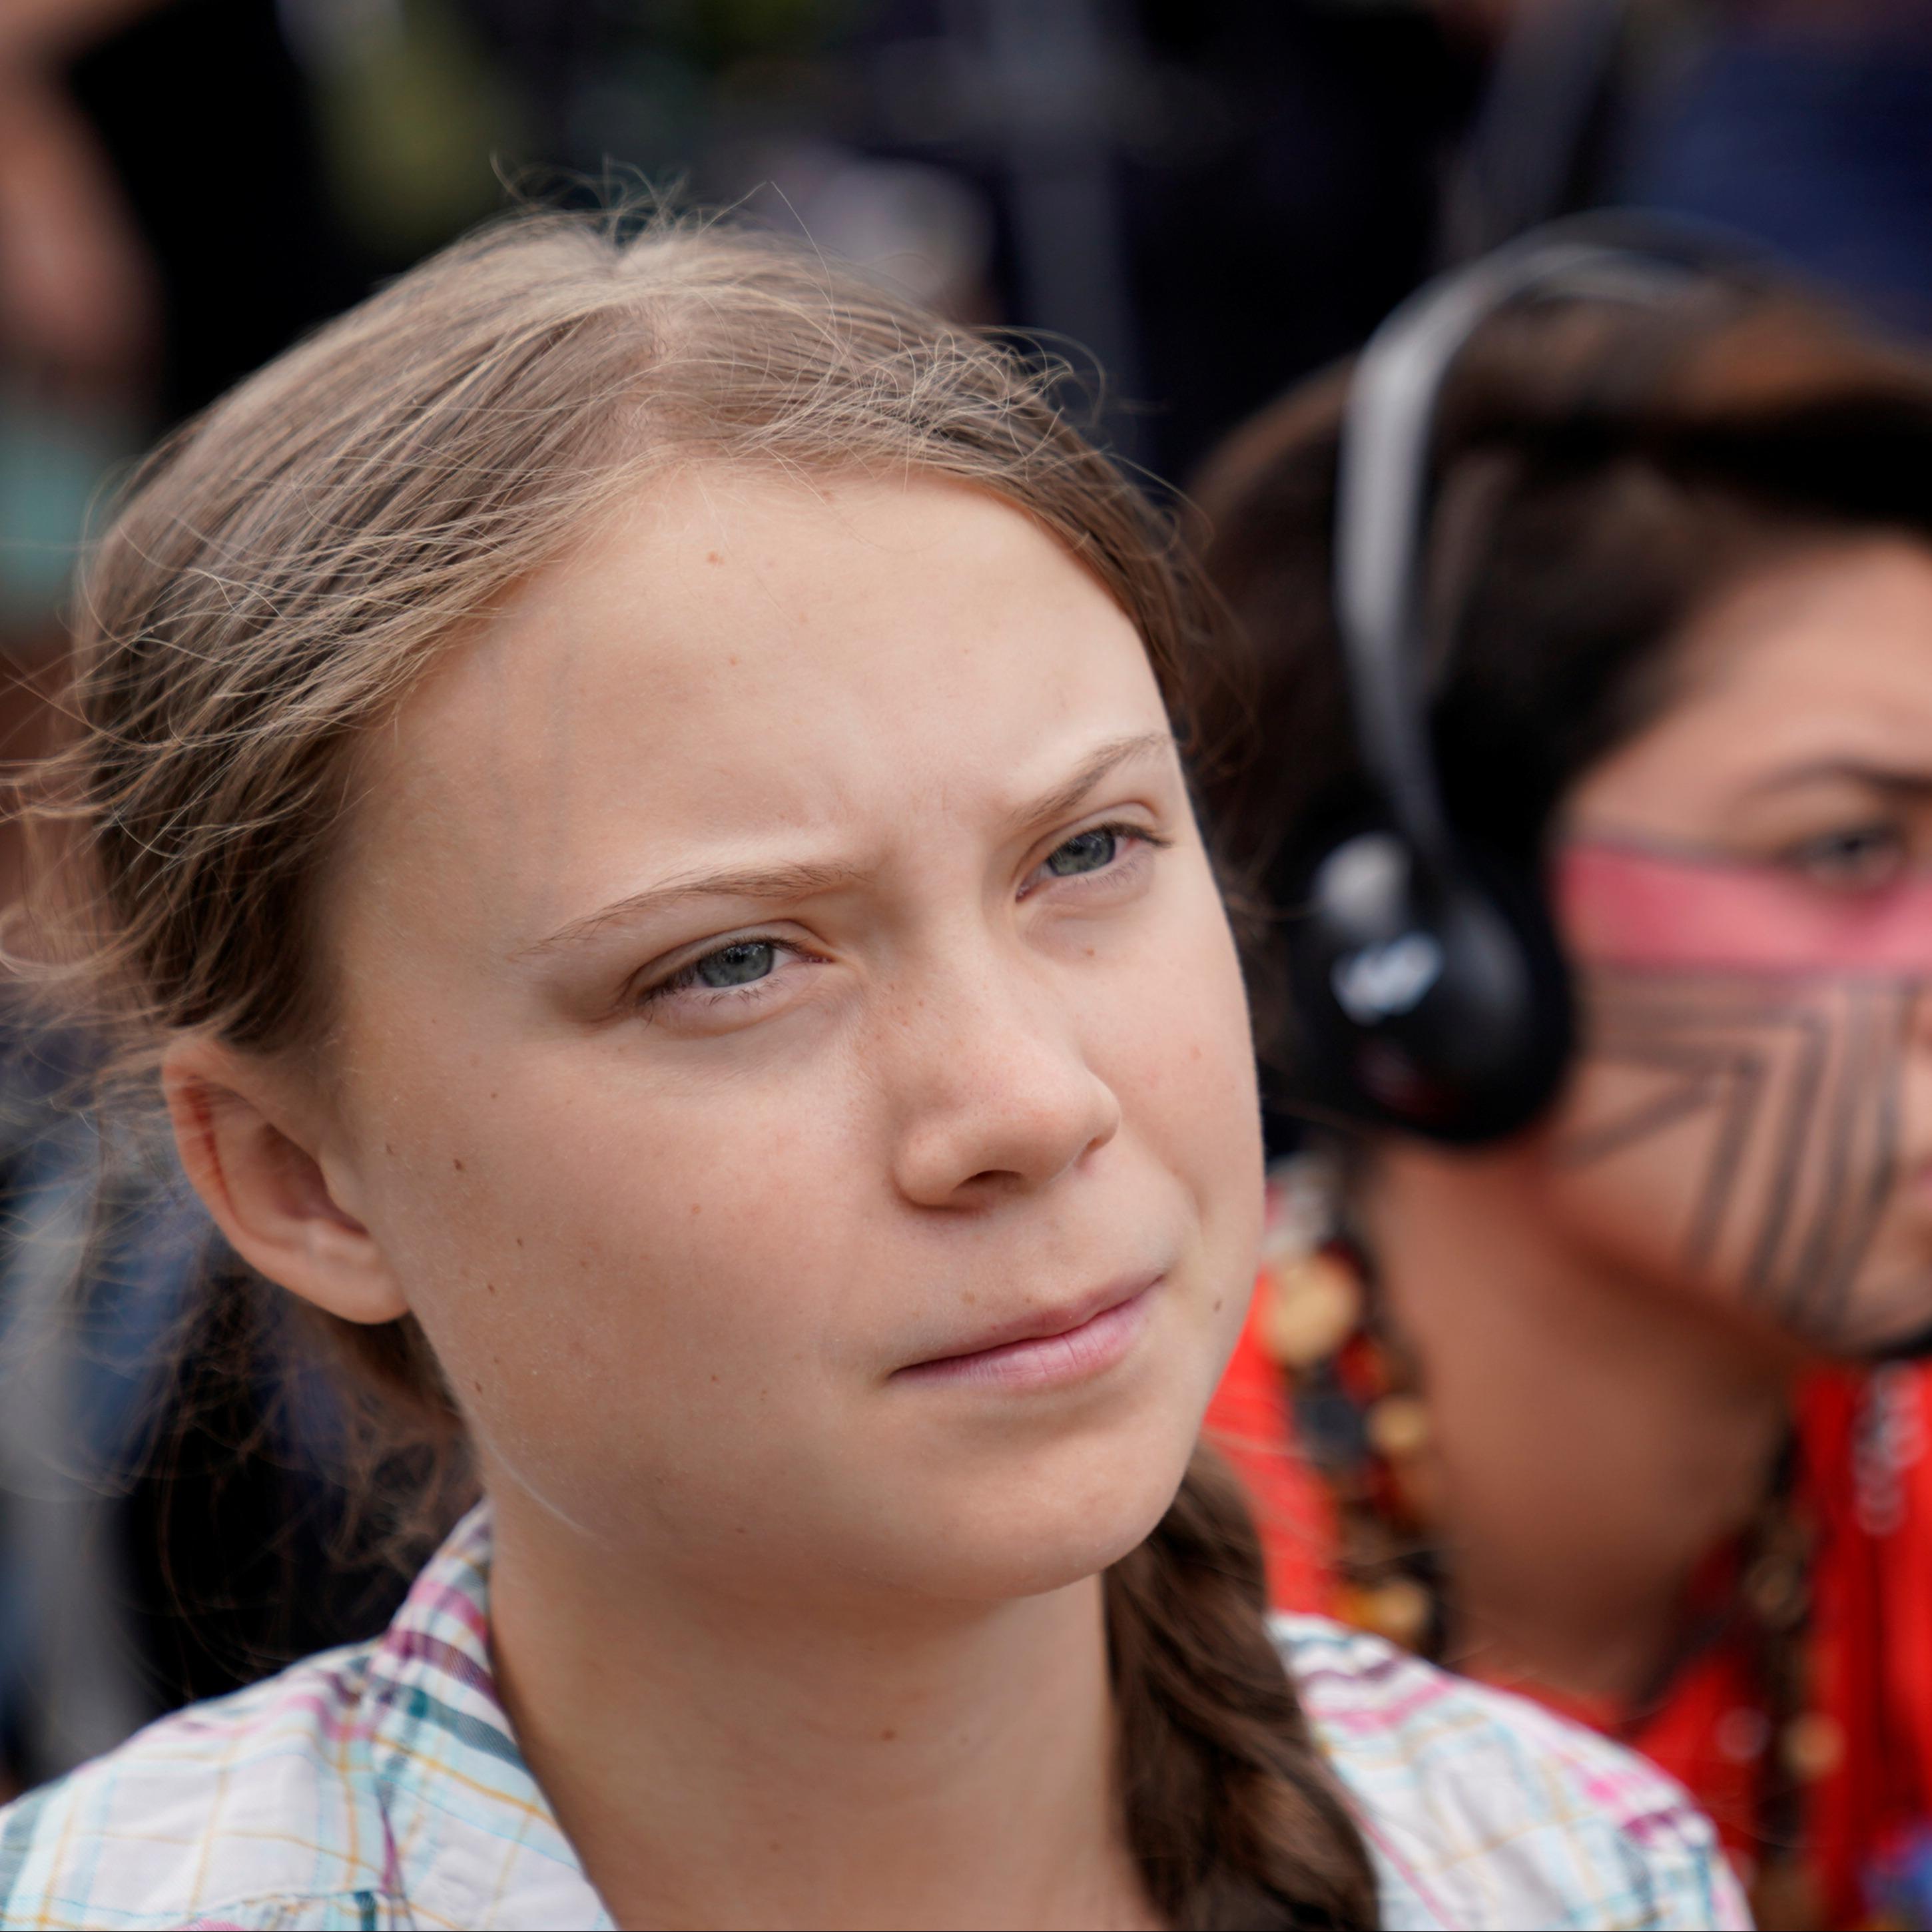 The Atlantic Greta Thunberg Is Right to Panic Link Thumbnail | Linktree